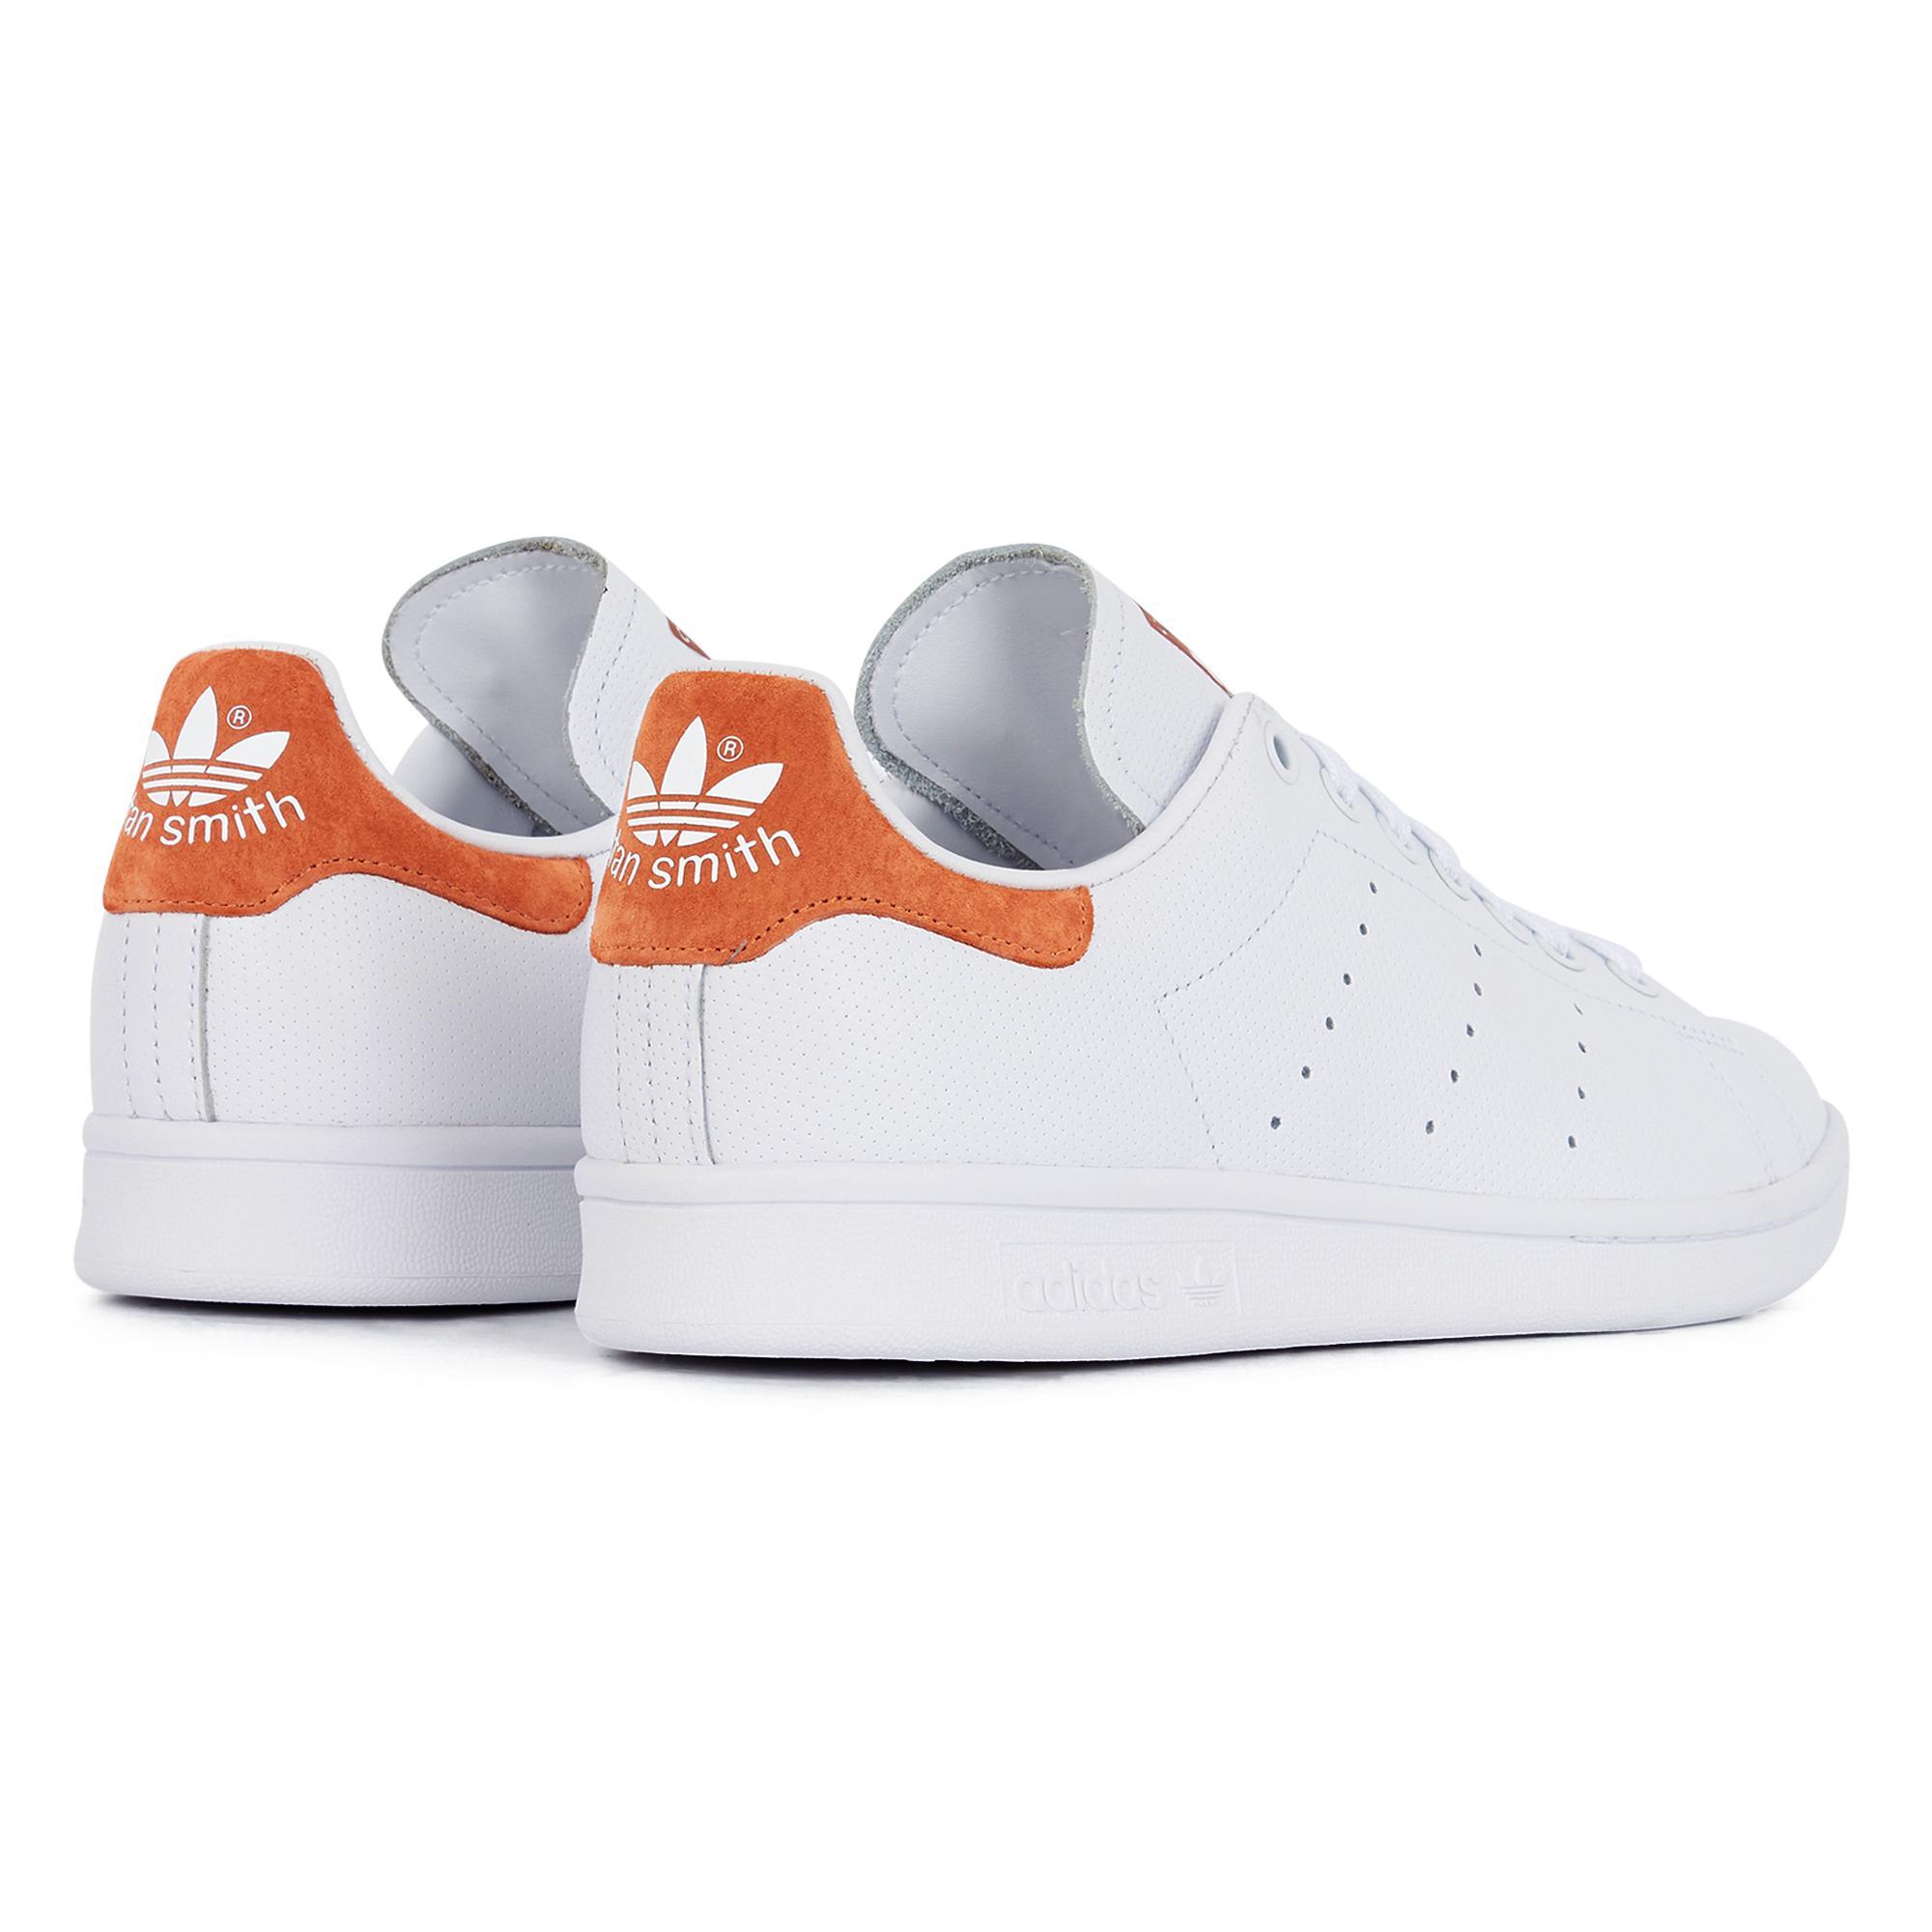 Adidas Stan Smith Perf